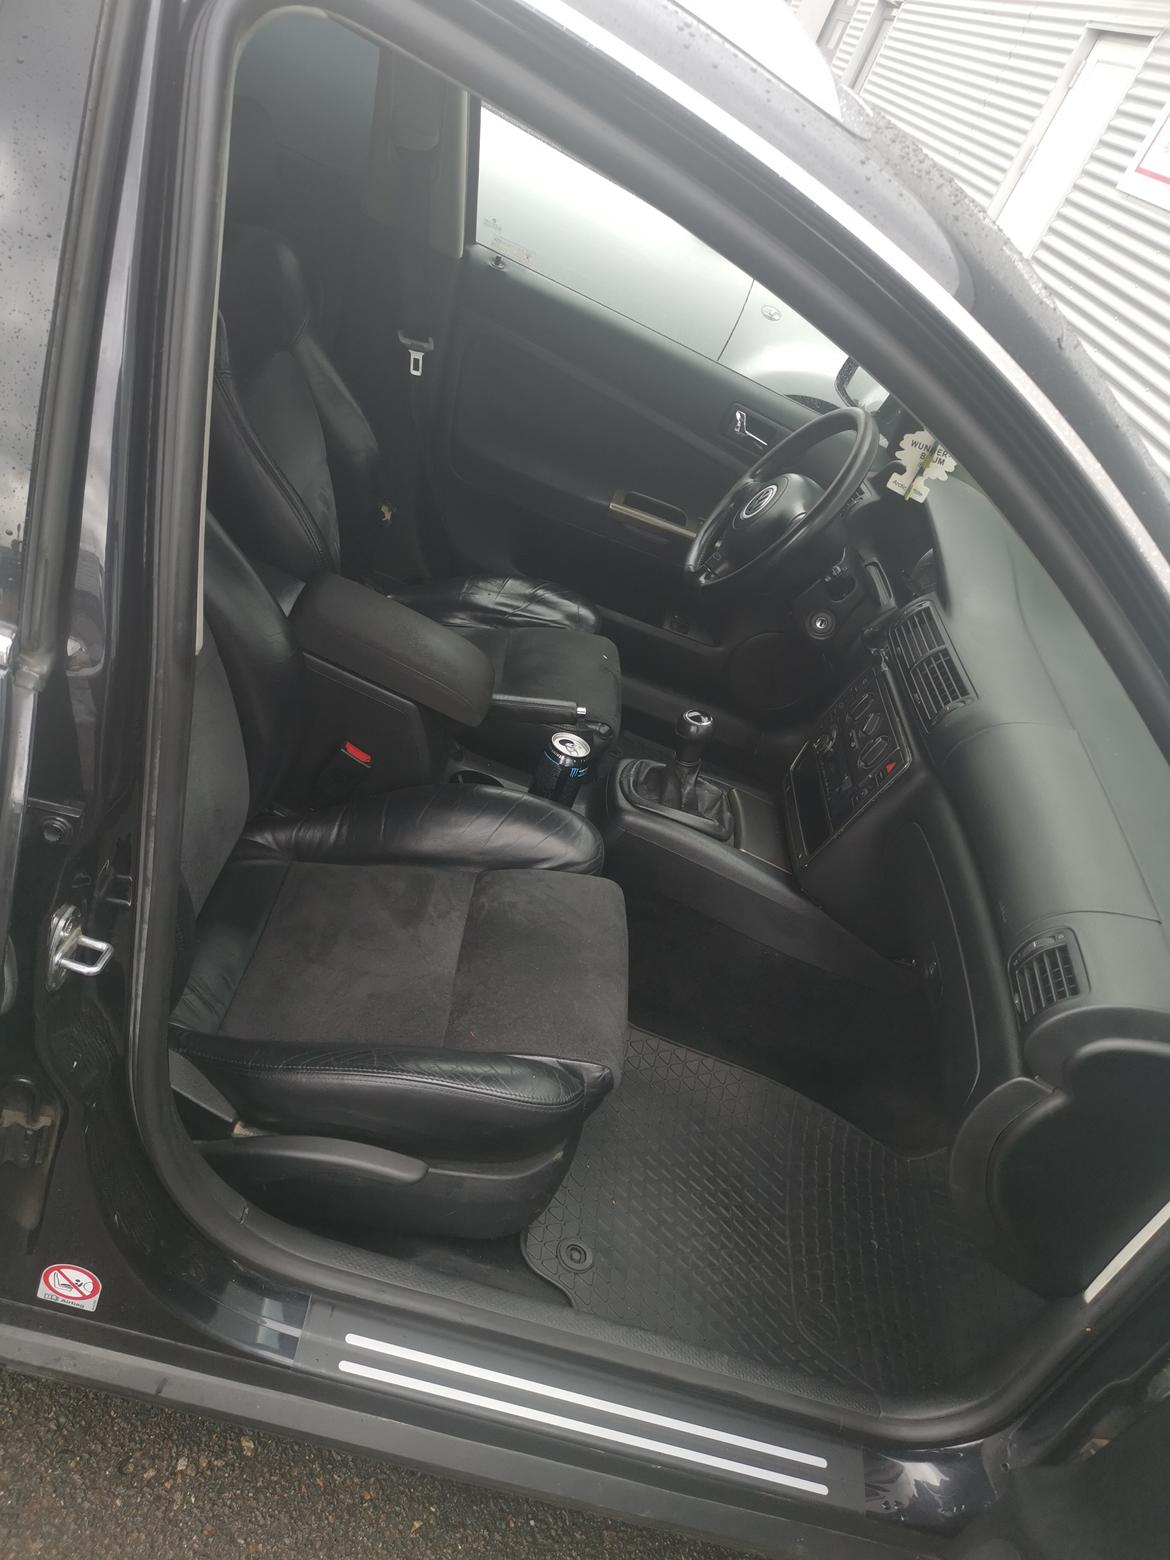 VW Passat 1.8T billede 3